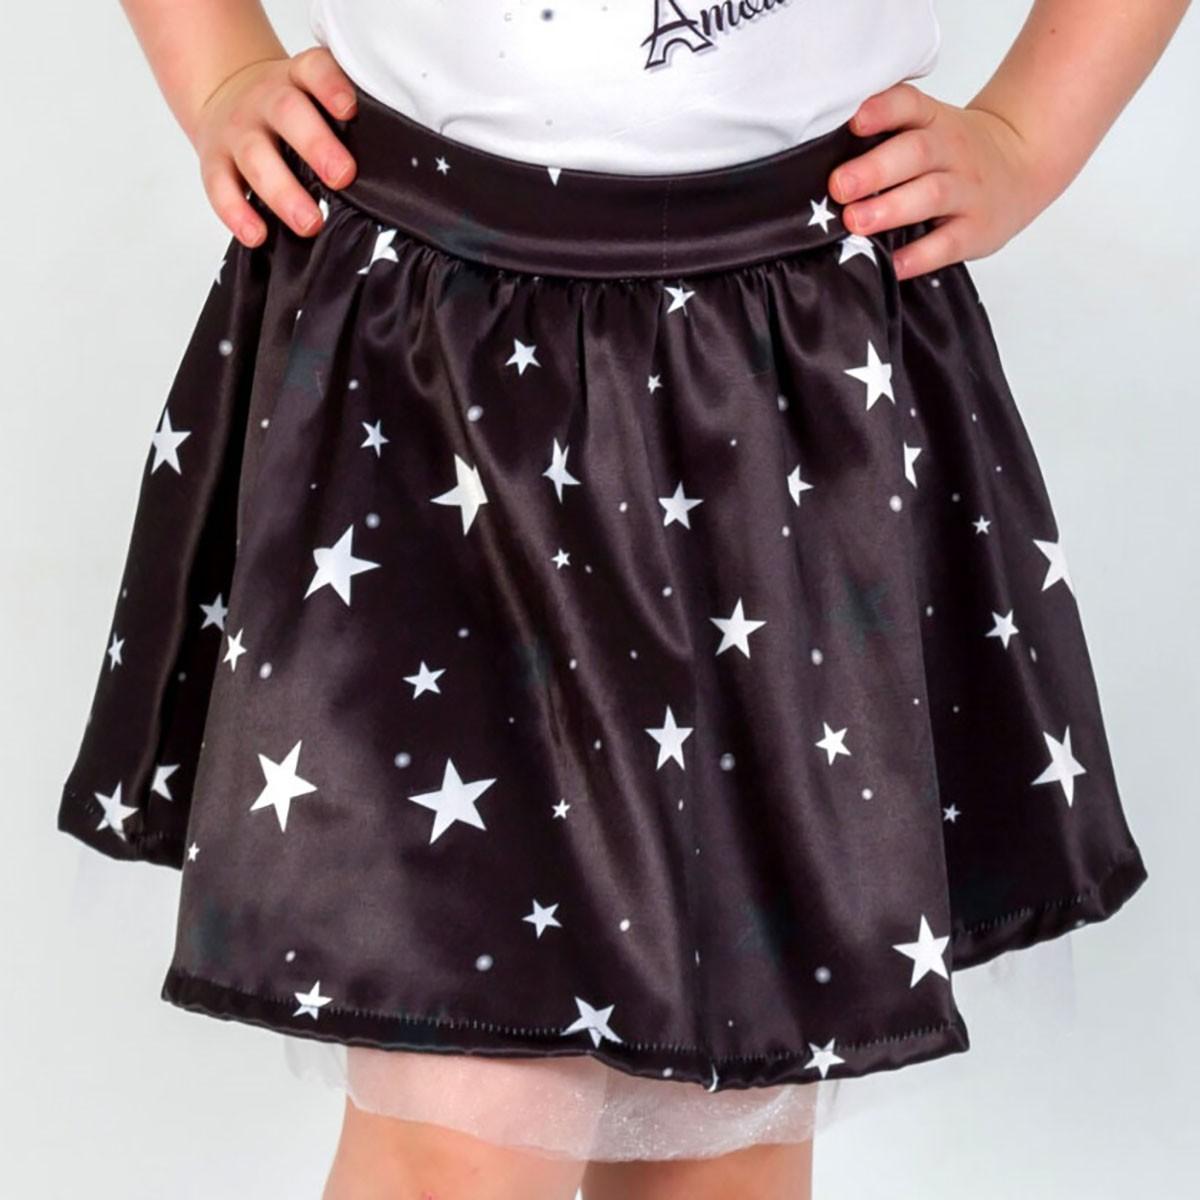 Saia Infantil Estrelas Preto